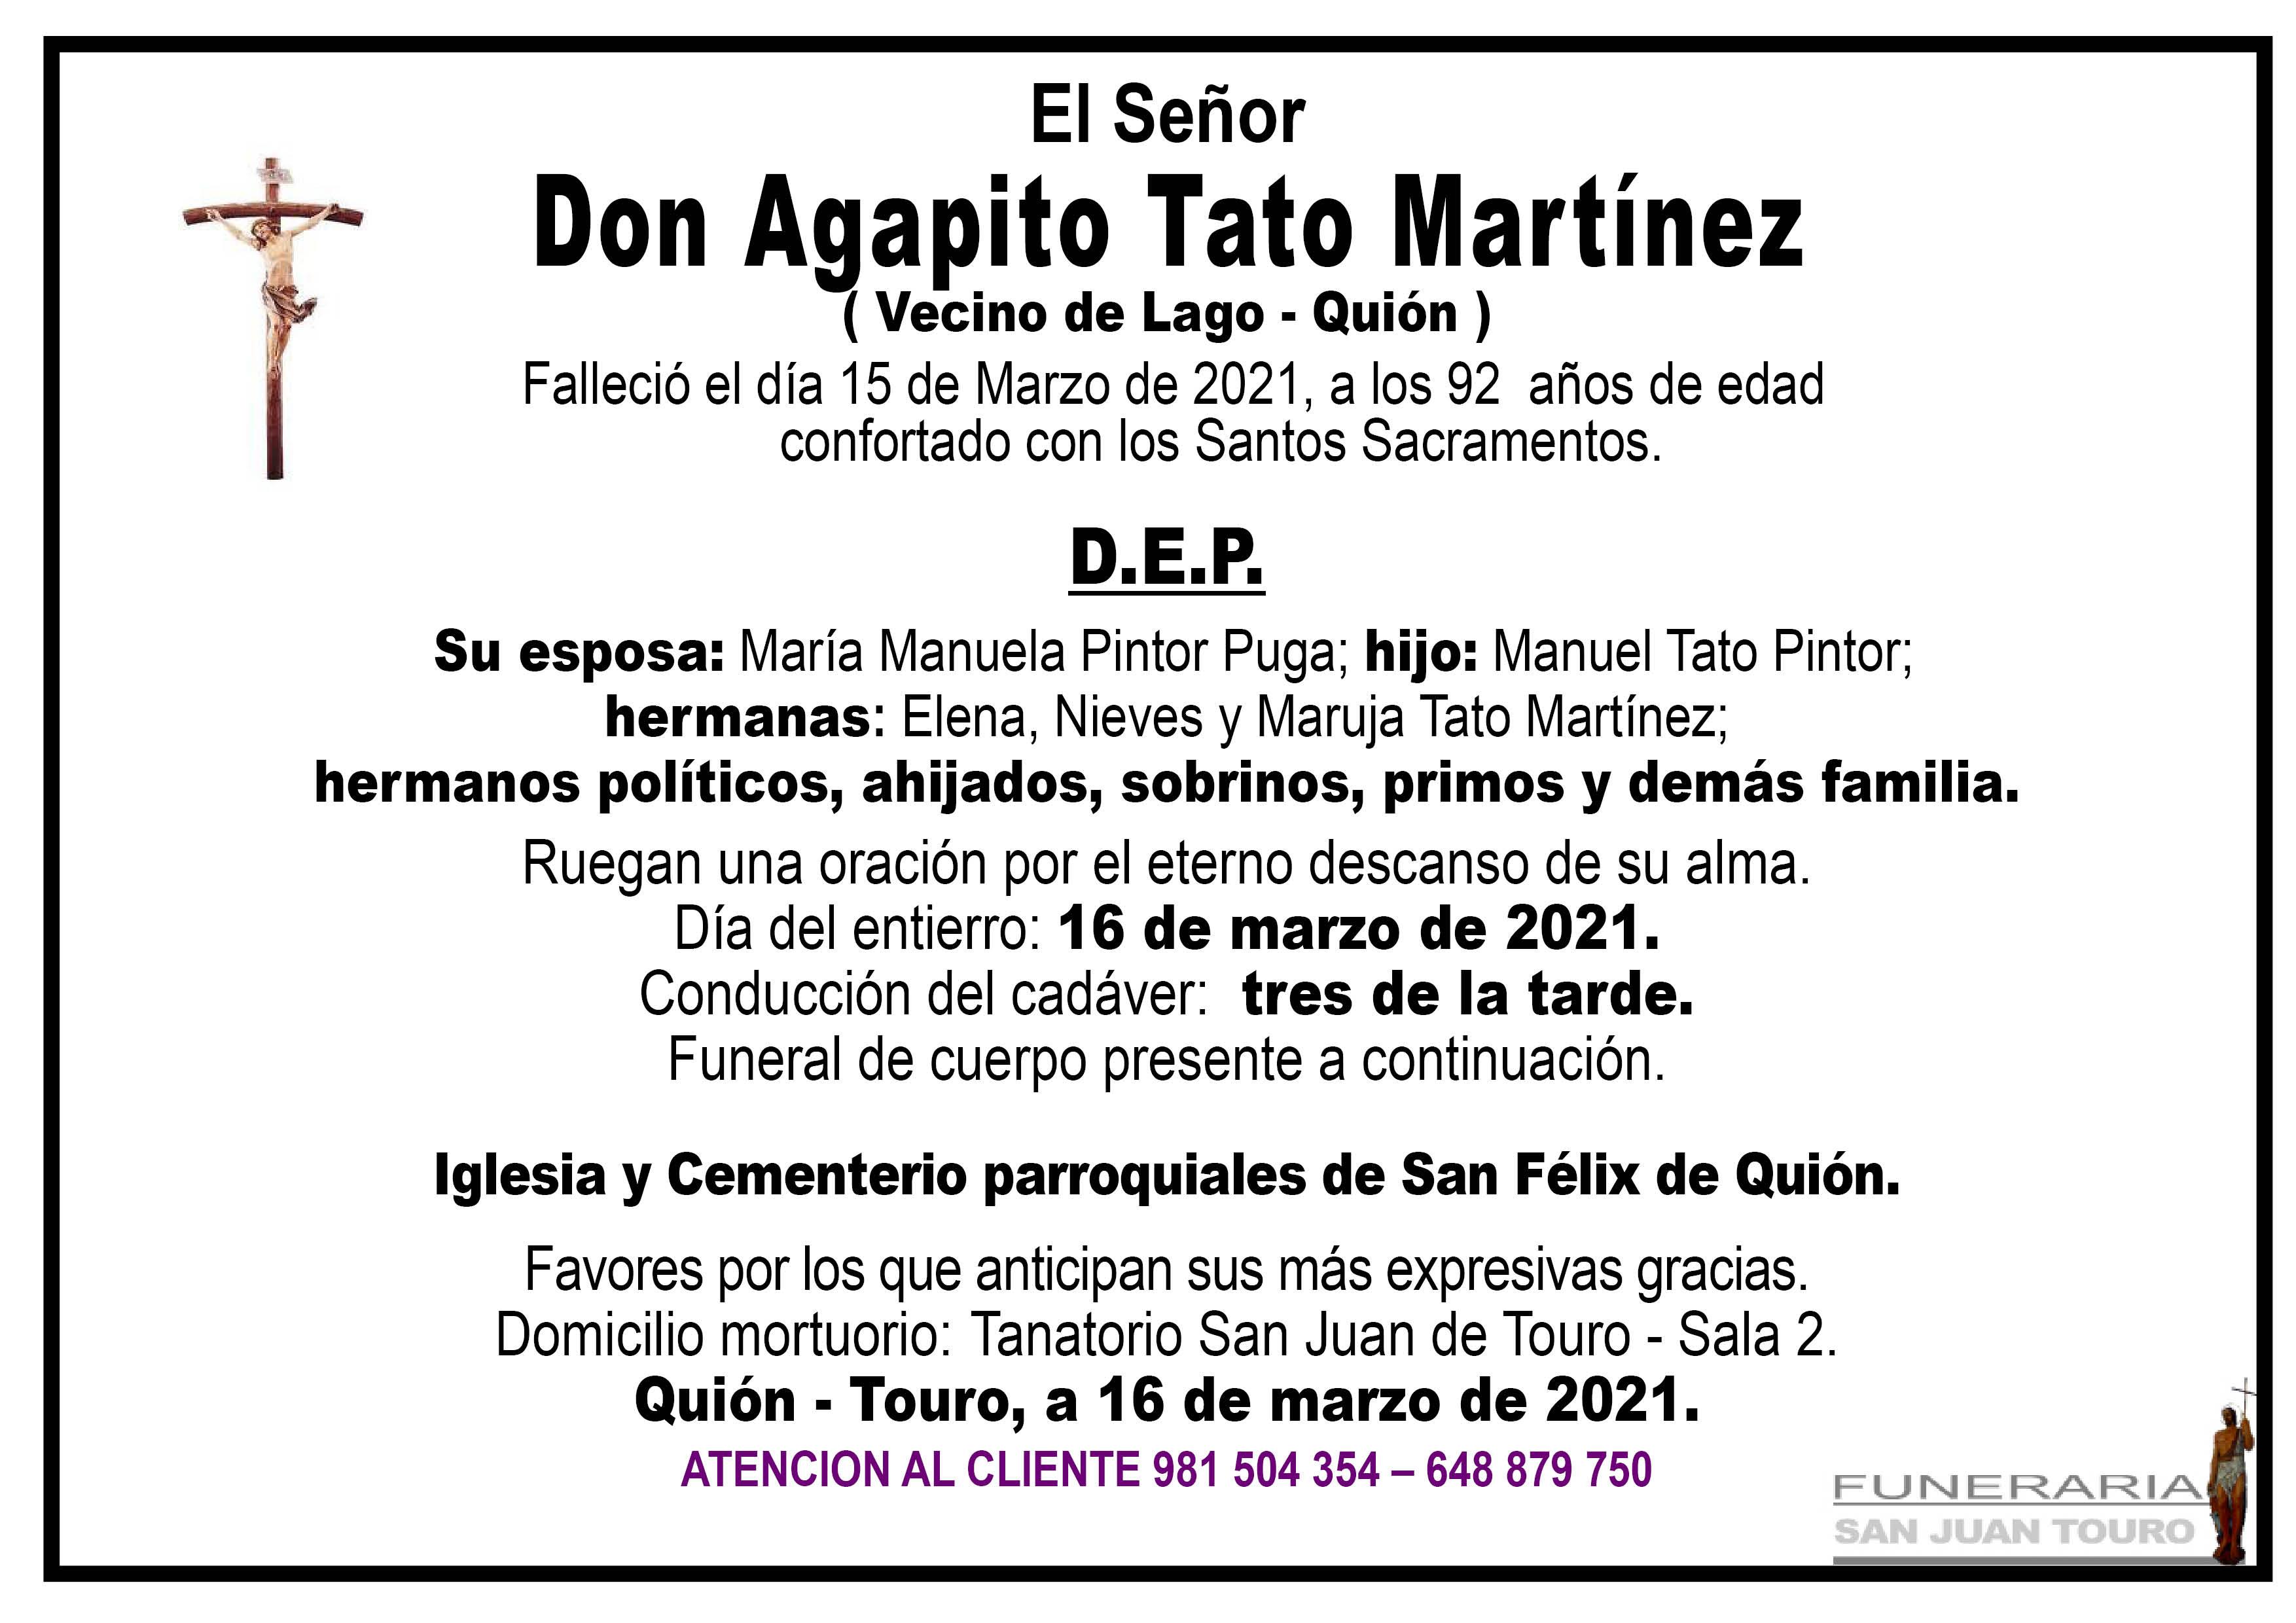 Esquela de SEPELIO DE DON AGAPITO TATO MARTÍNEZ